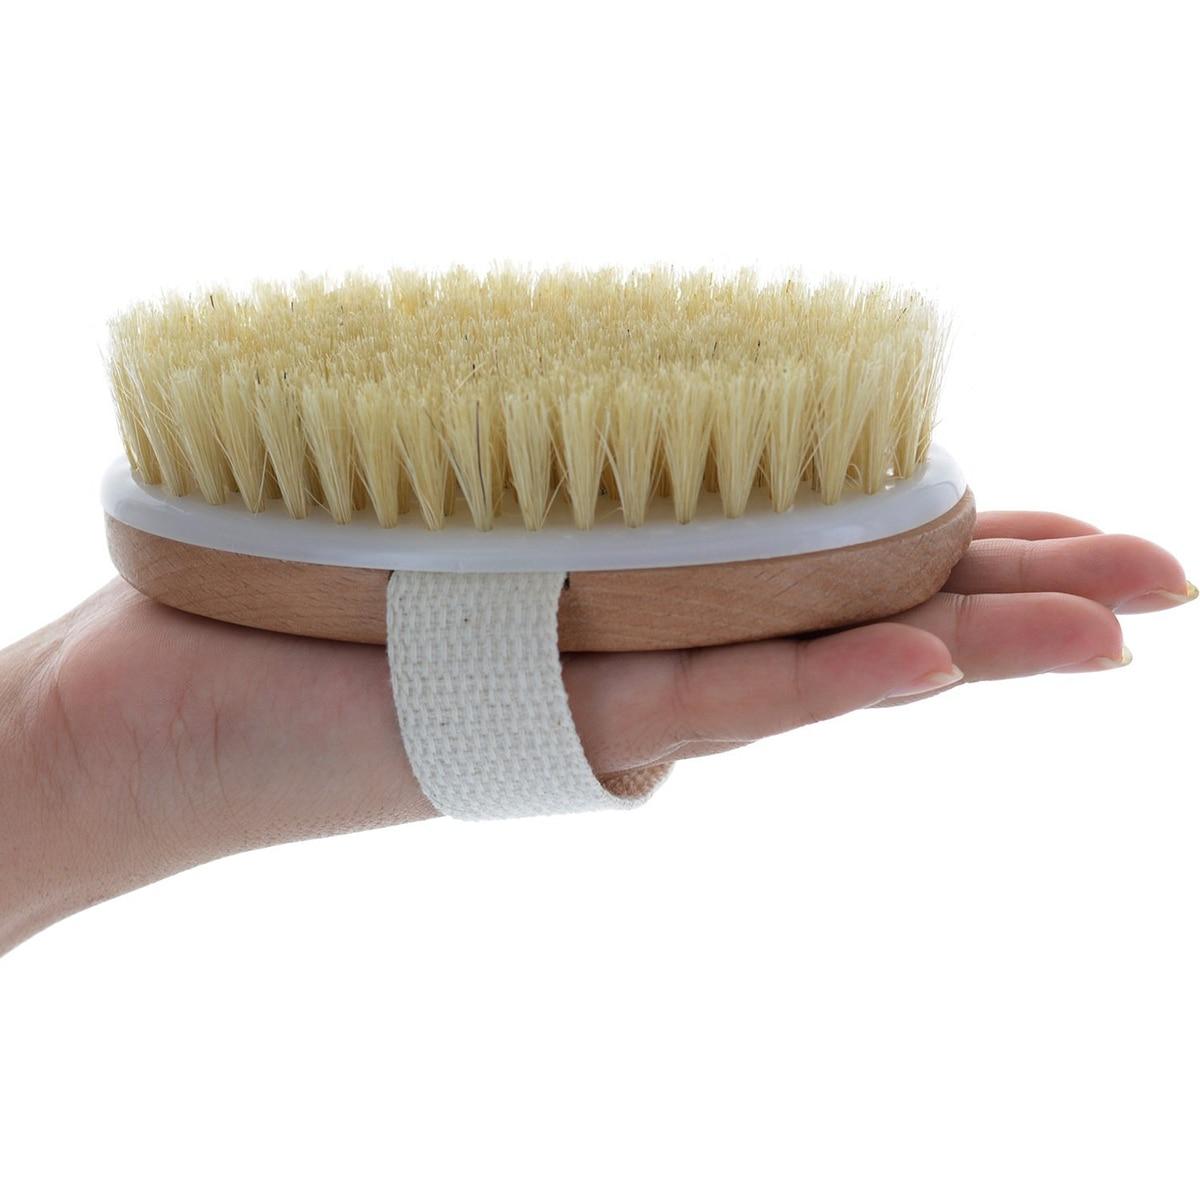 Image Result For Natural Bristle Skin Brush